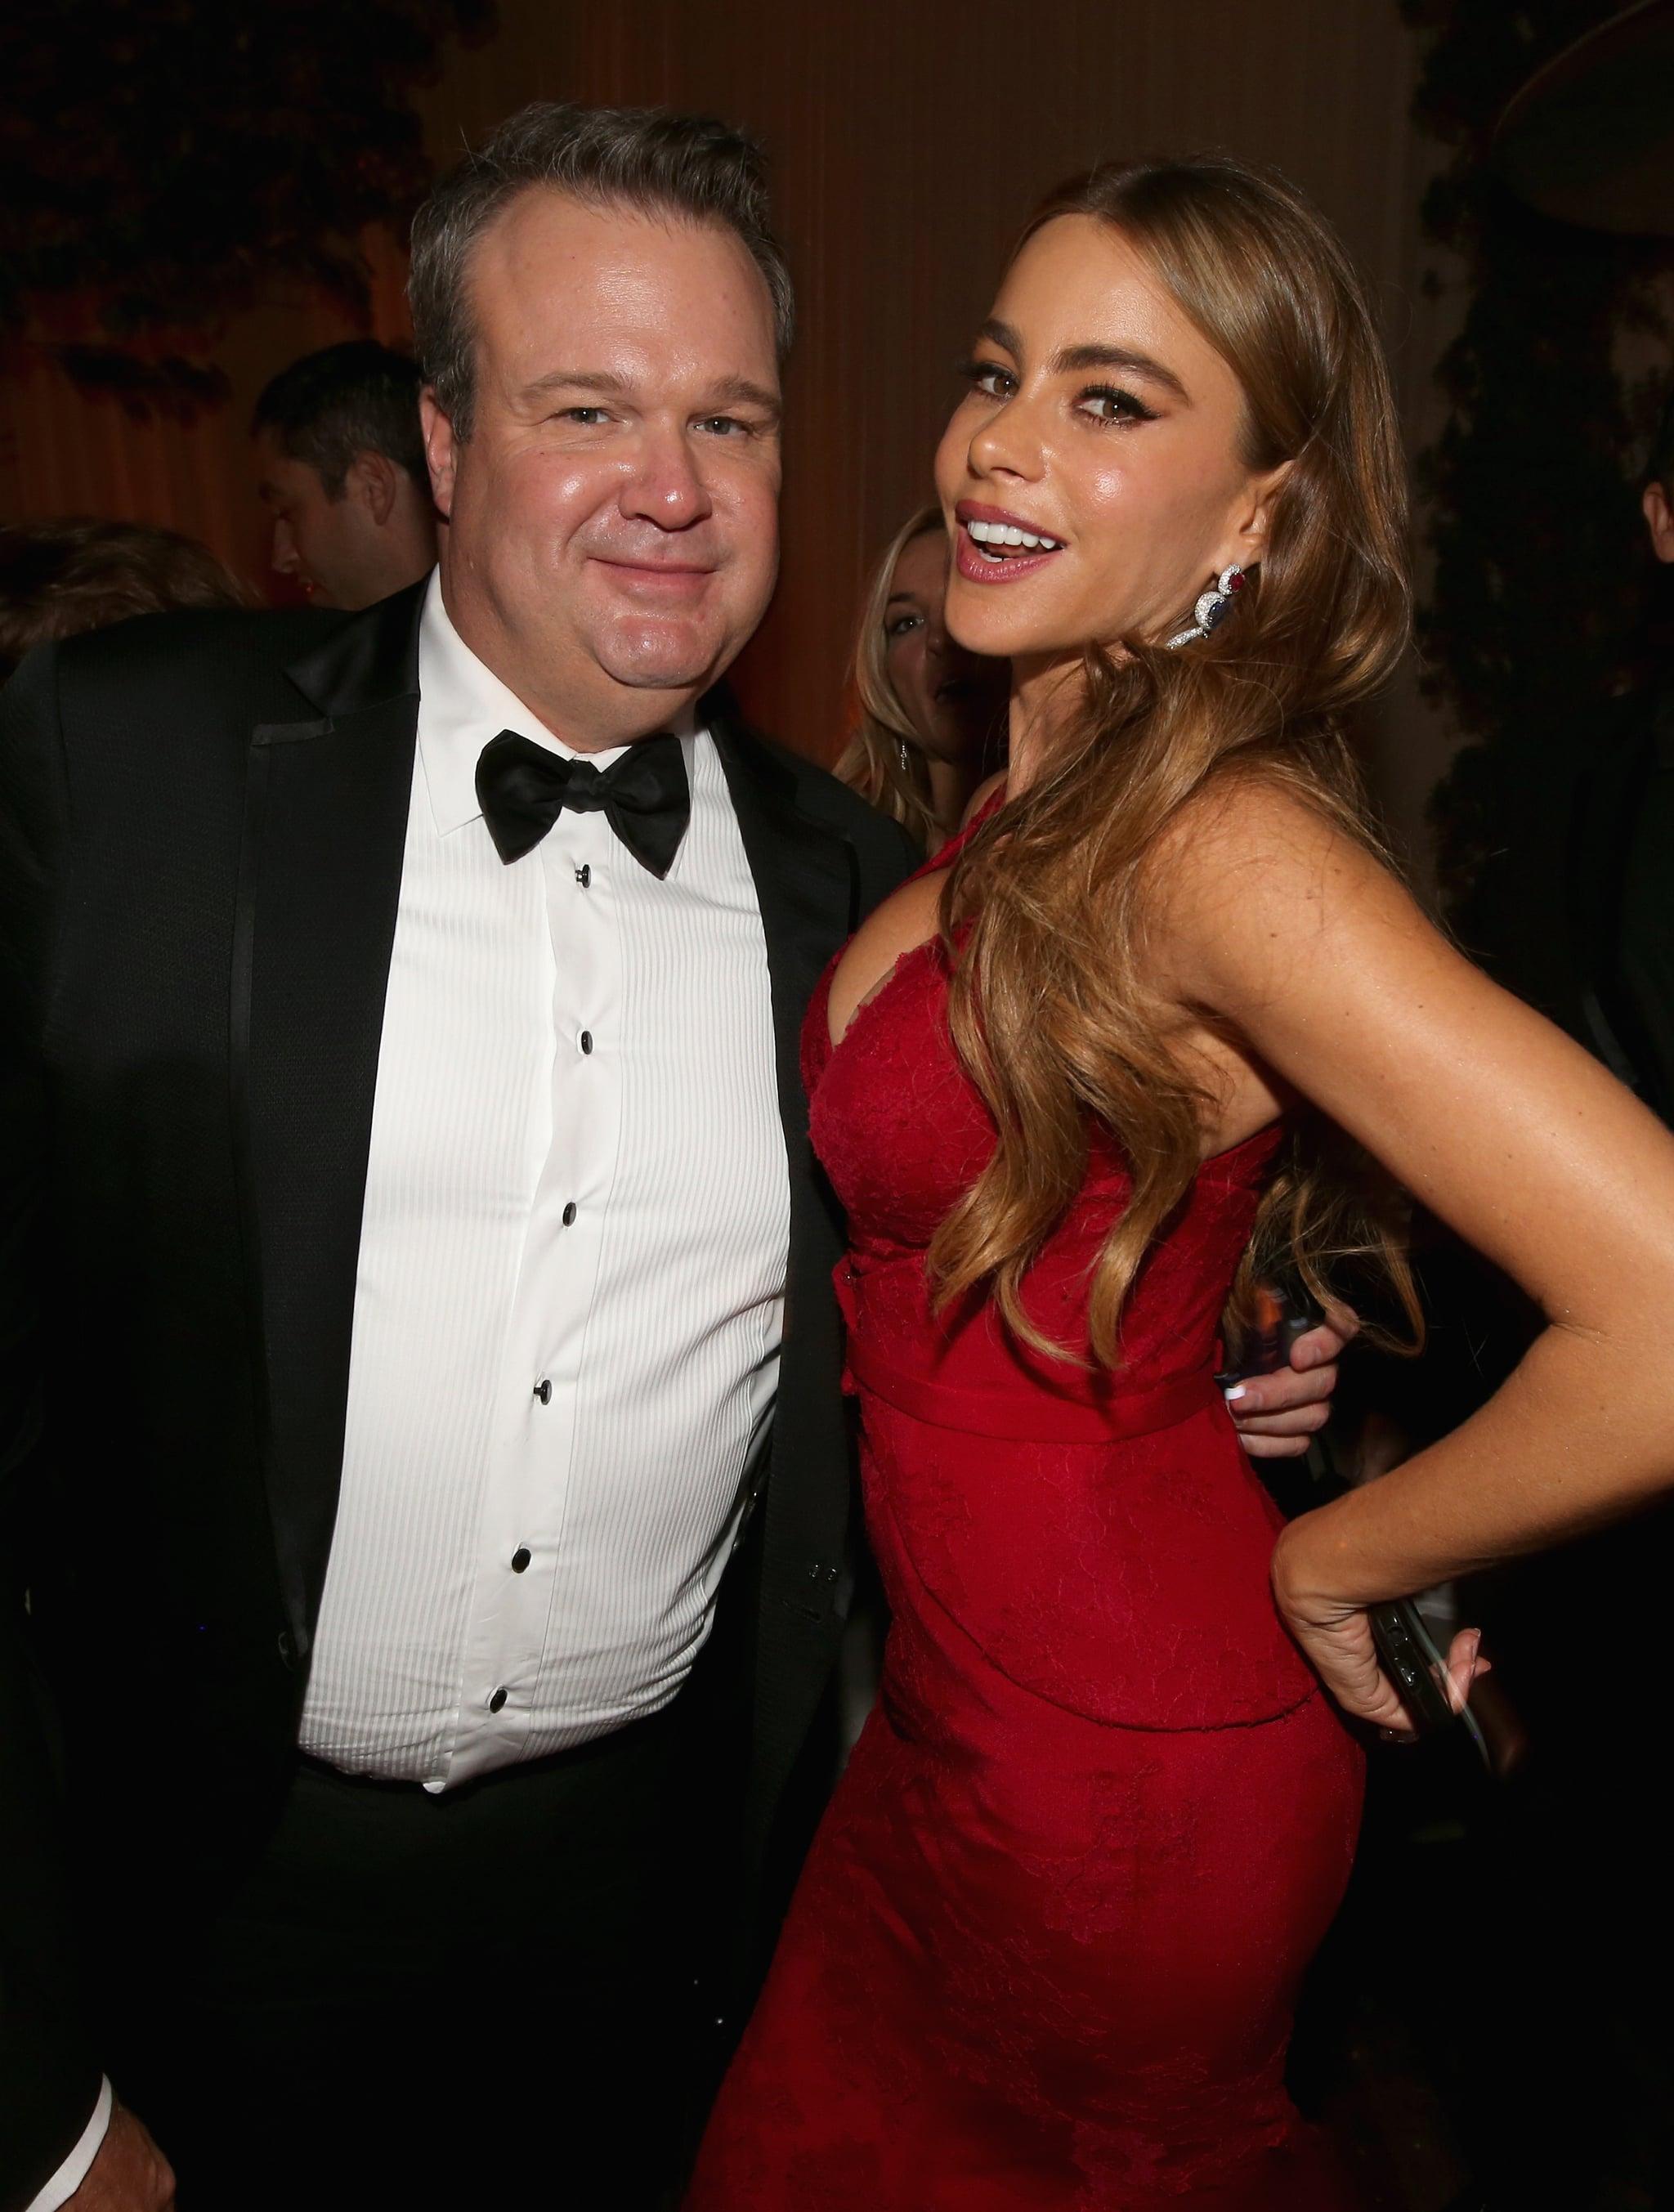 Sofia Vergara mingled with Eric Stonestreet at the Fox afterpaty.